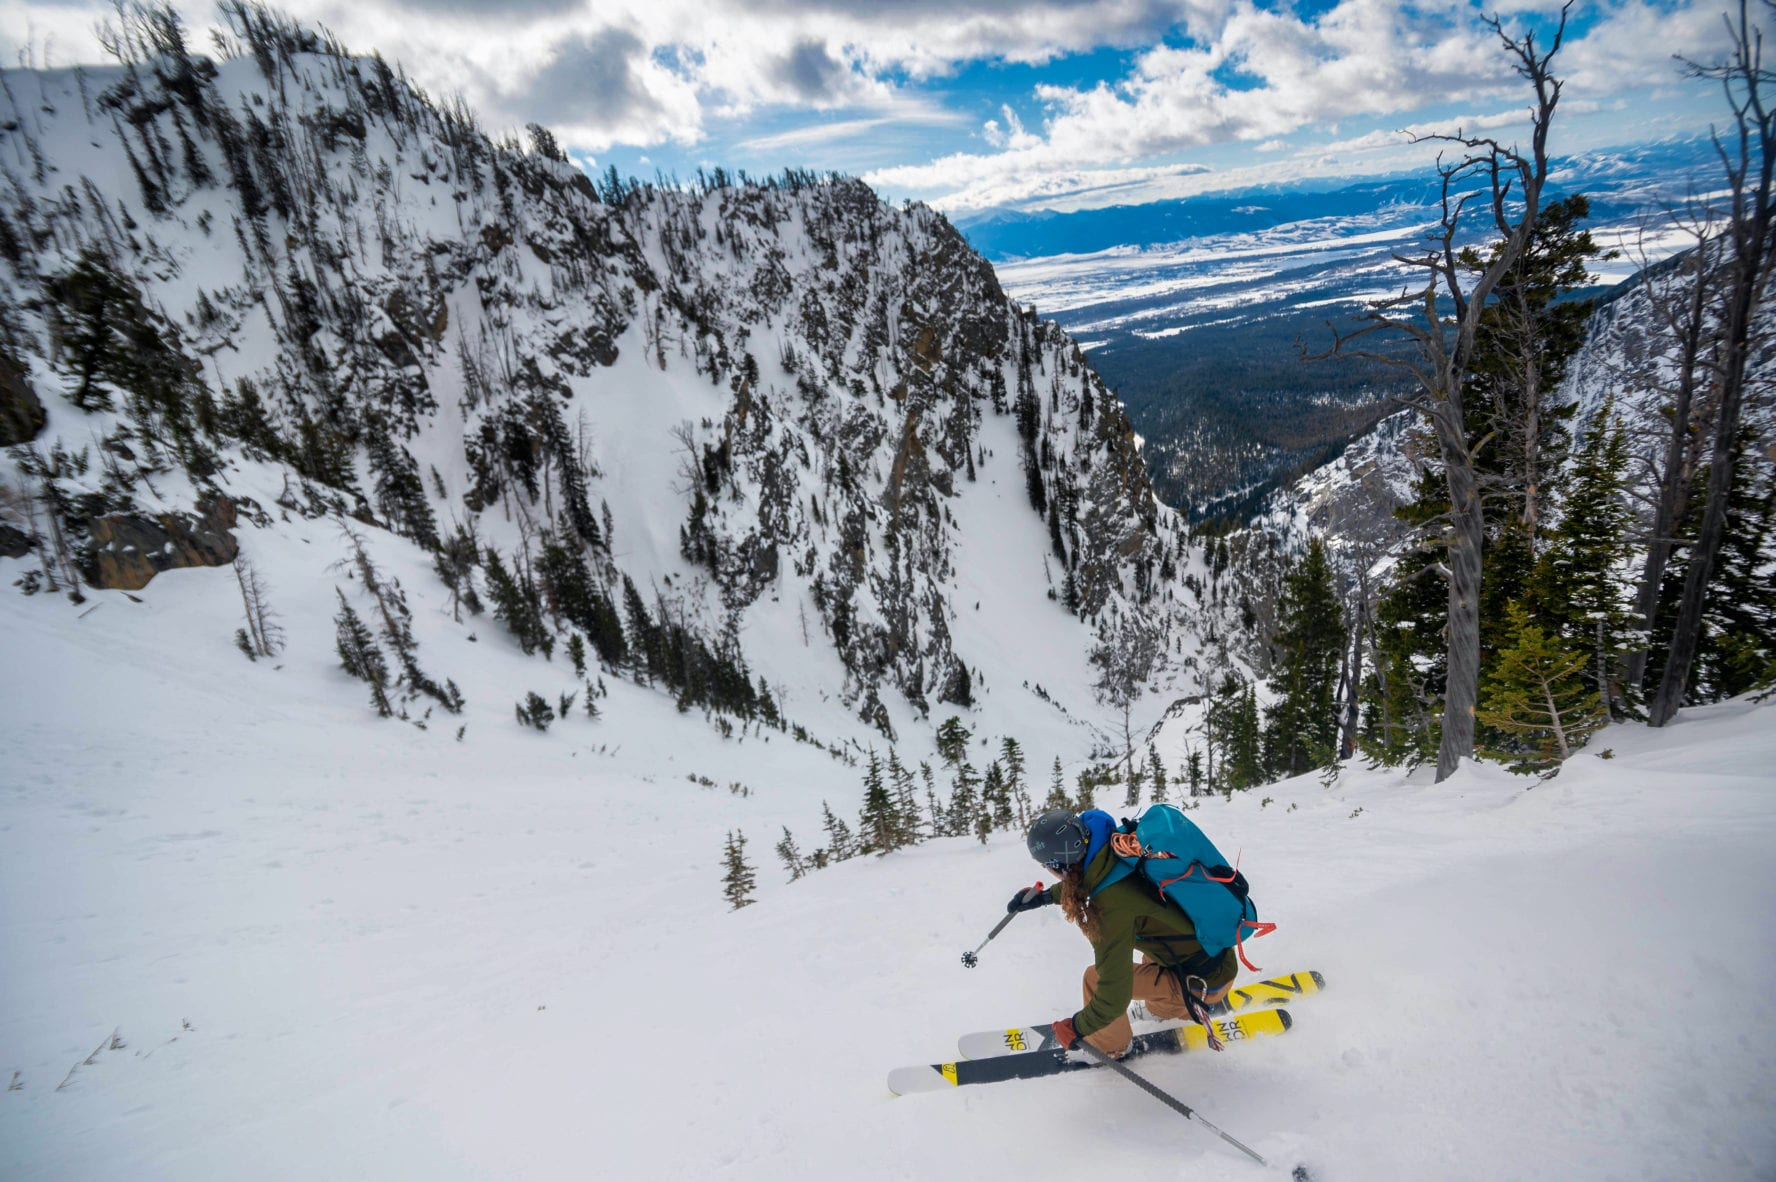 Jackson Hole backcountry skiing